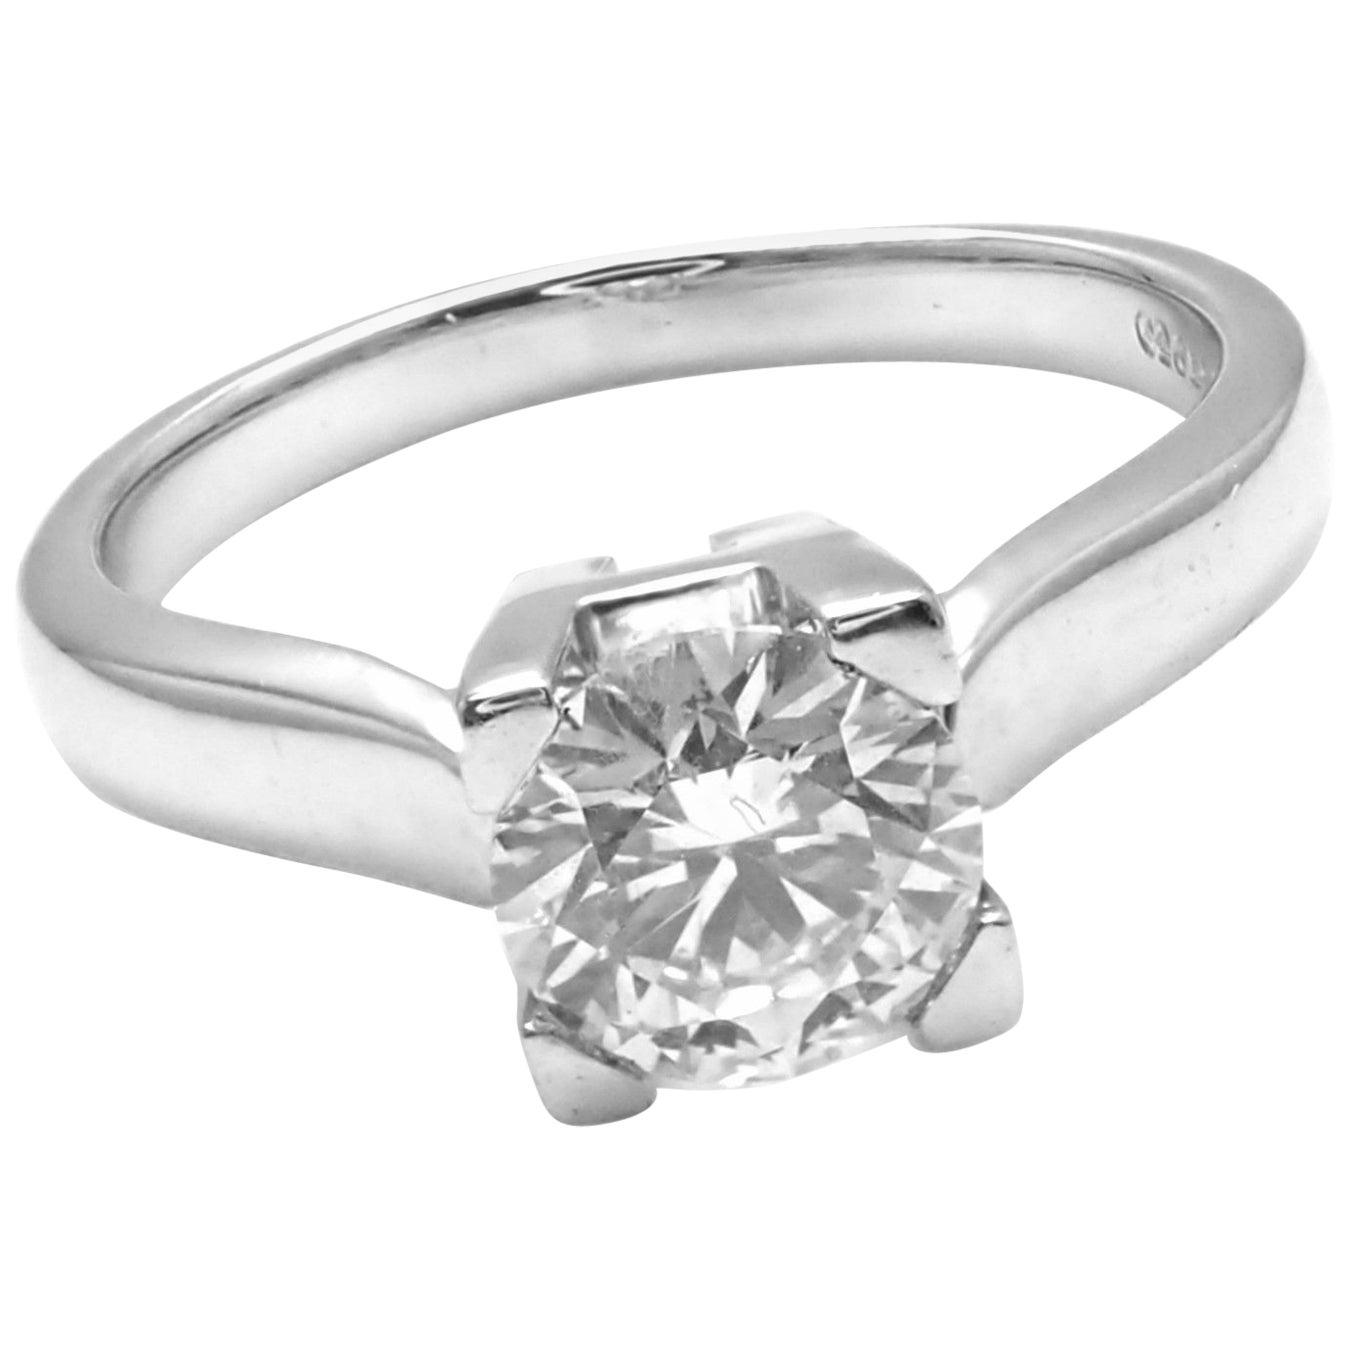 Harry Winston .71 Carat VVS2/F Diamond Solitaire Platinum Engagement Ring